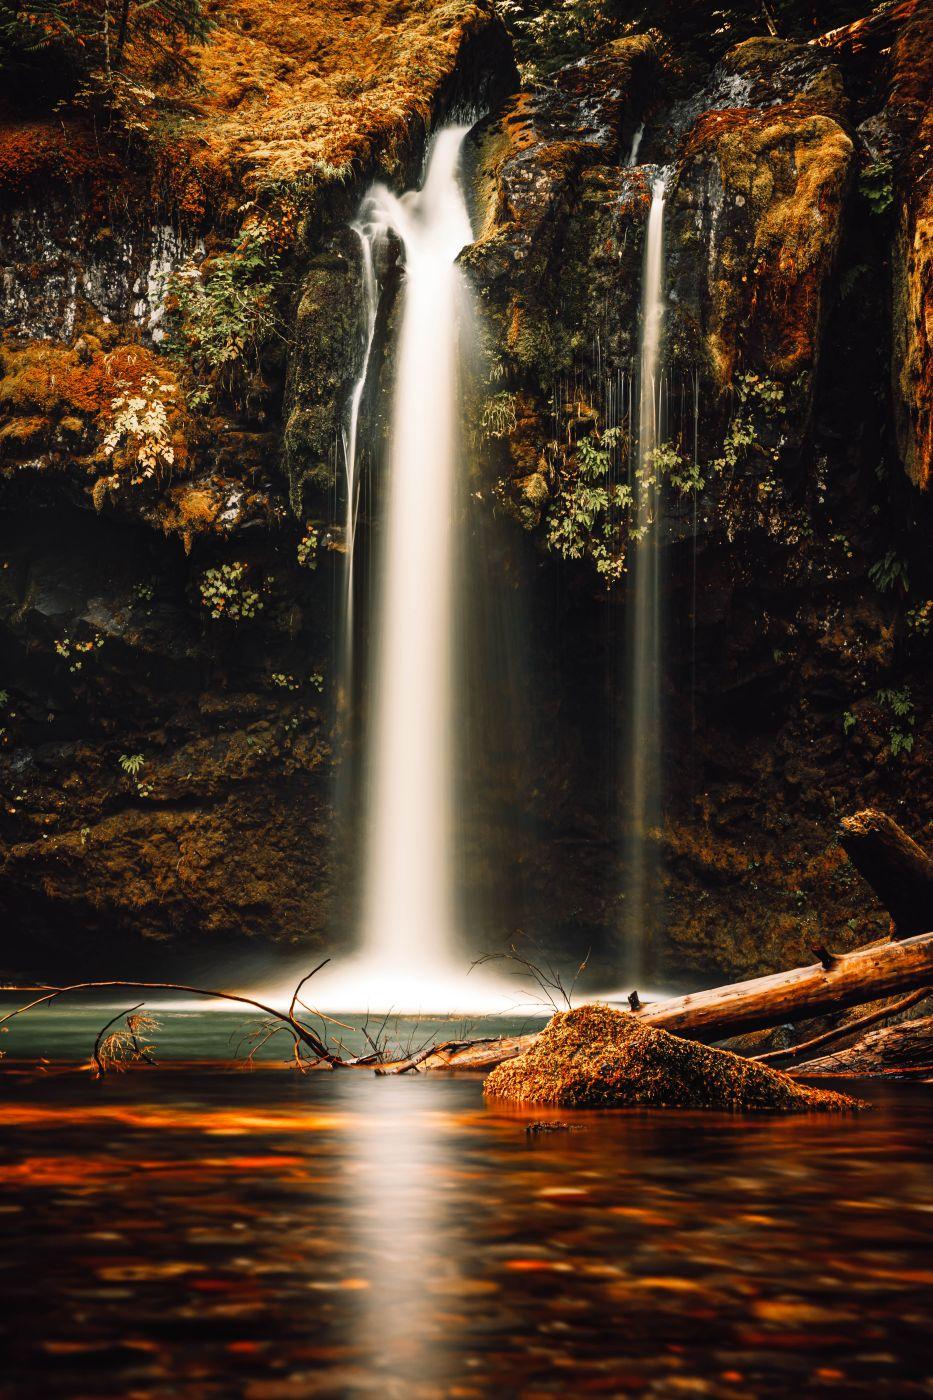 Iron Creek falls, USA